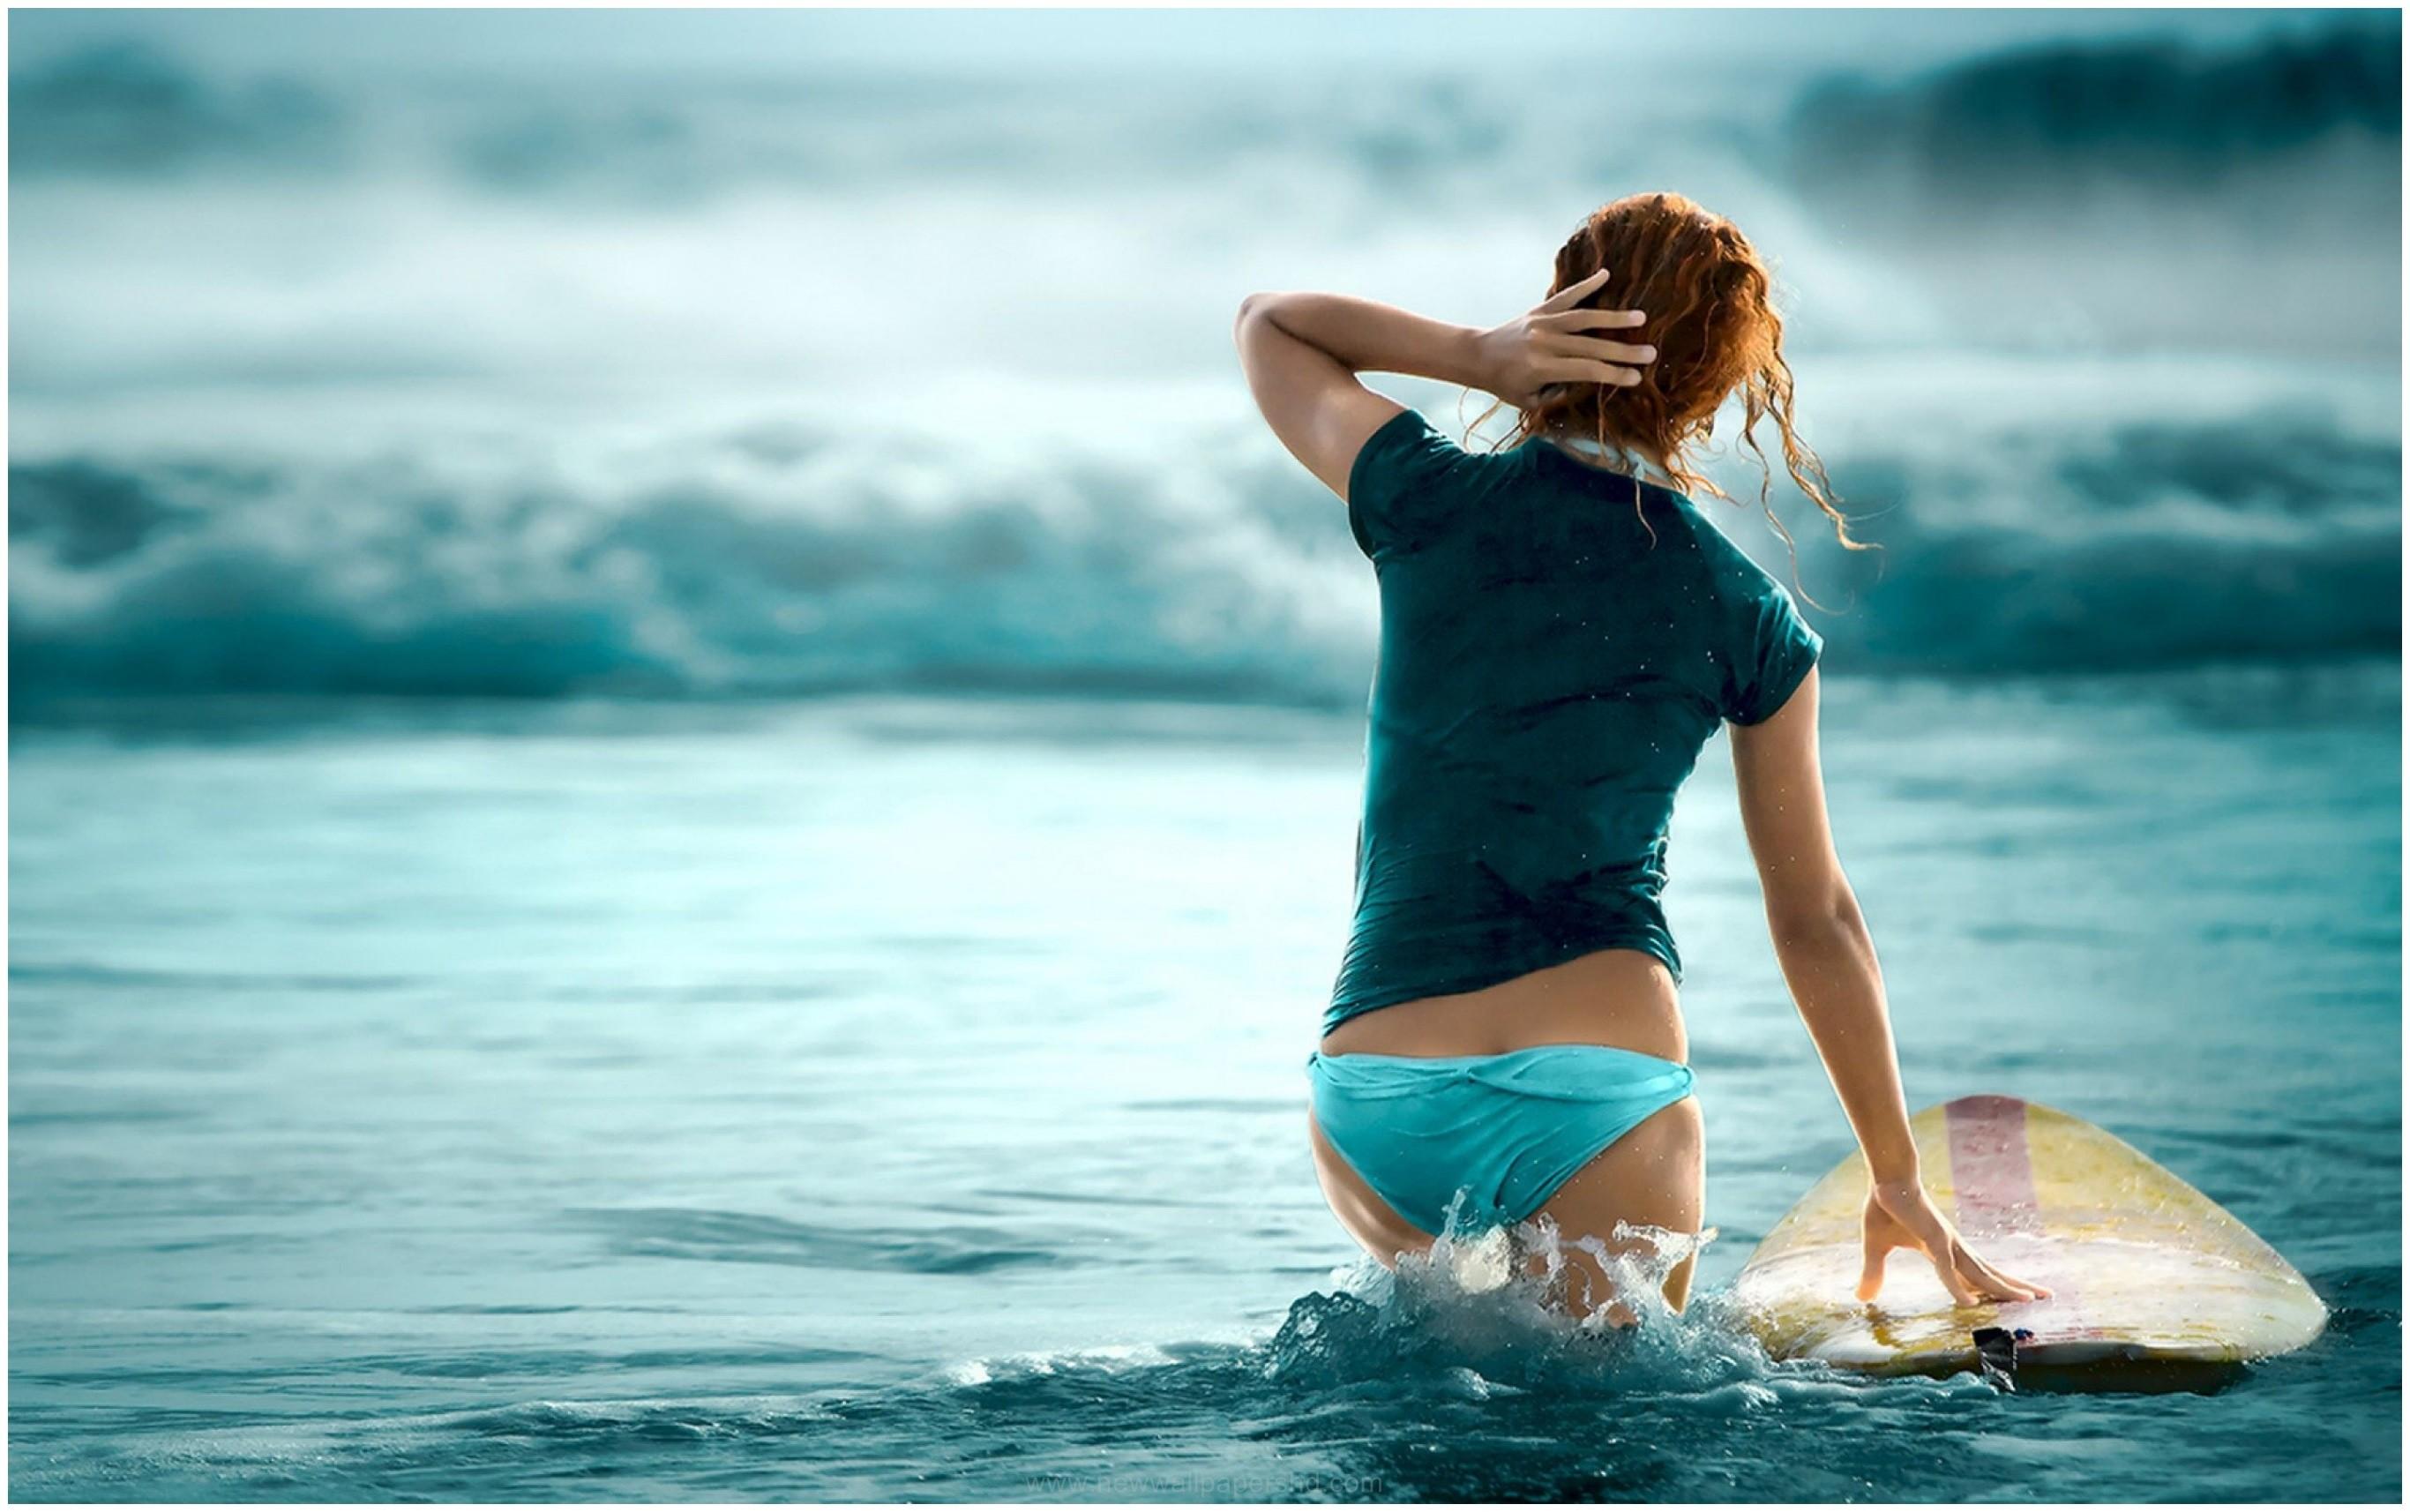 SURFER GIRL HD WALLPAPER